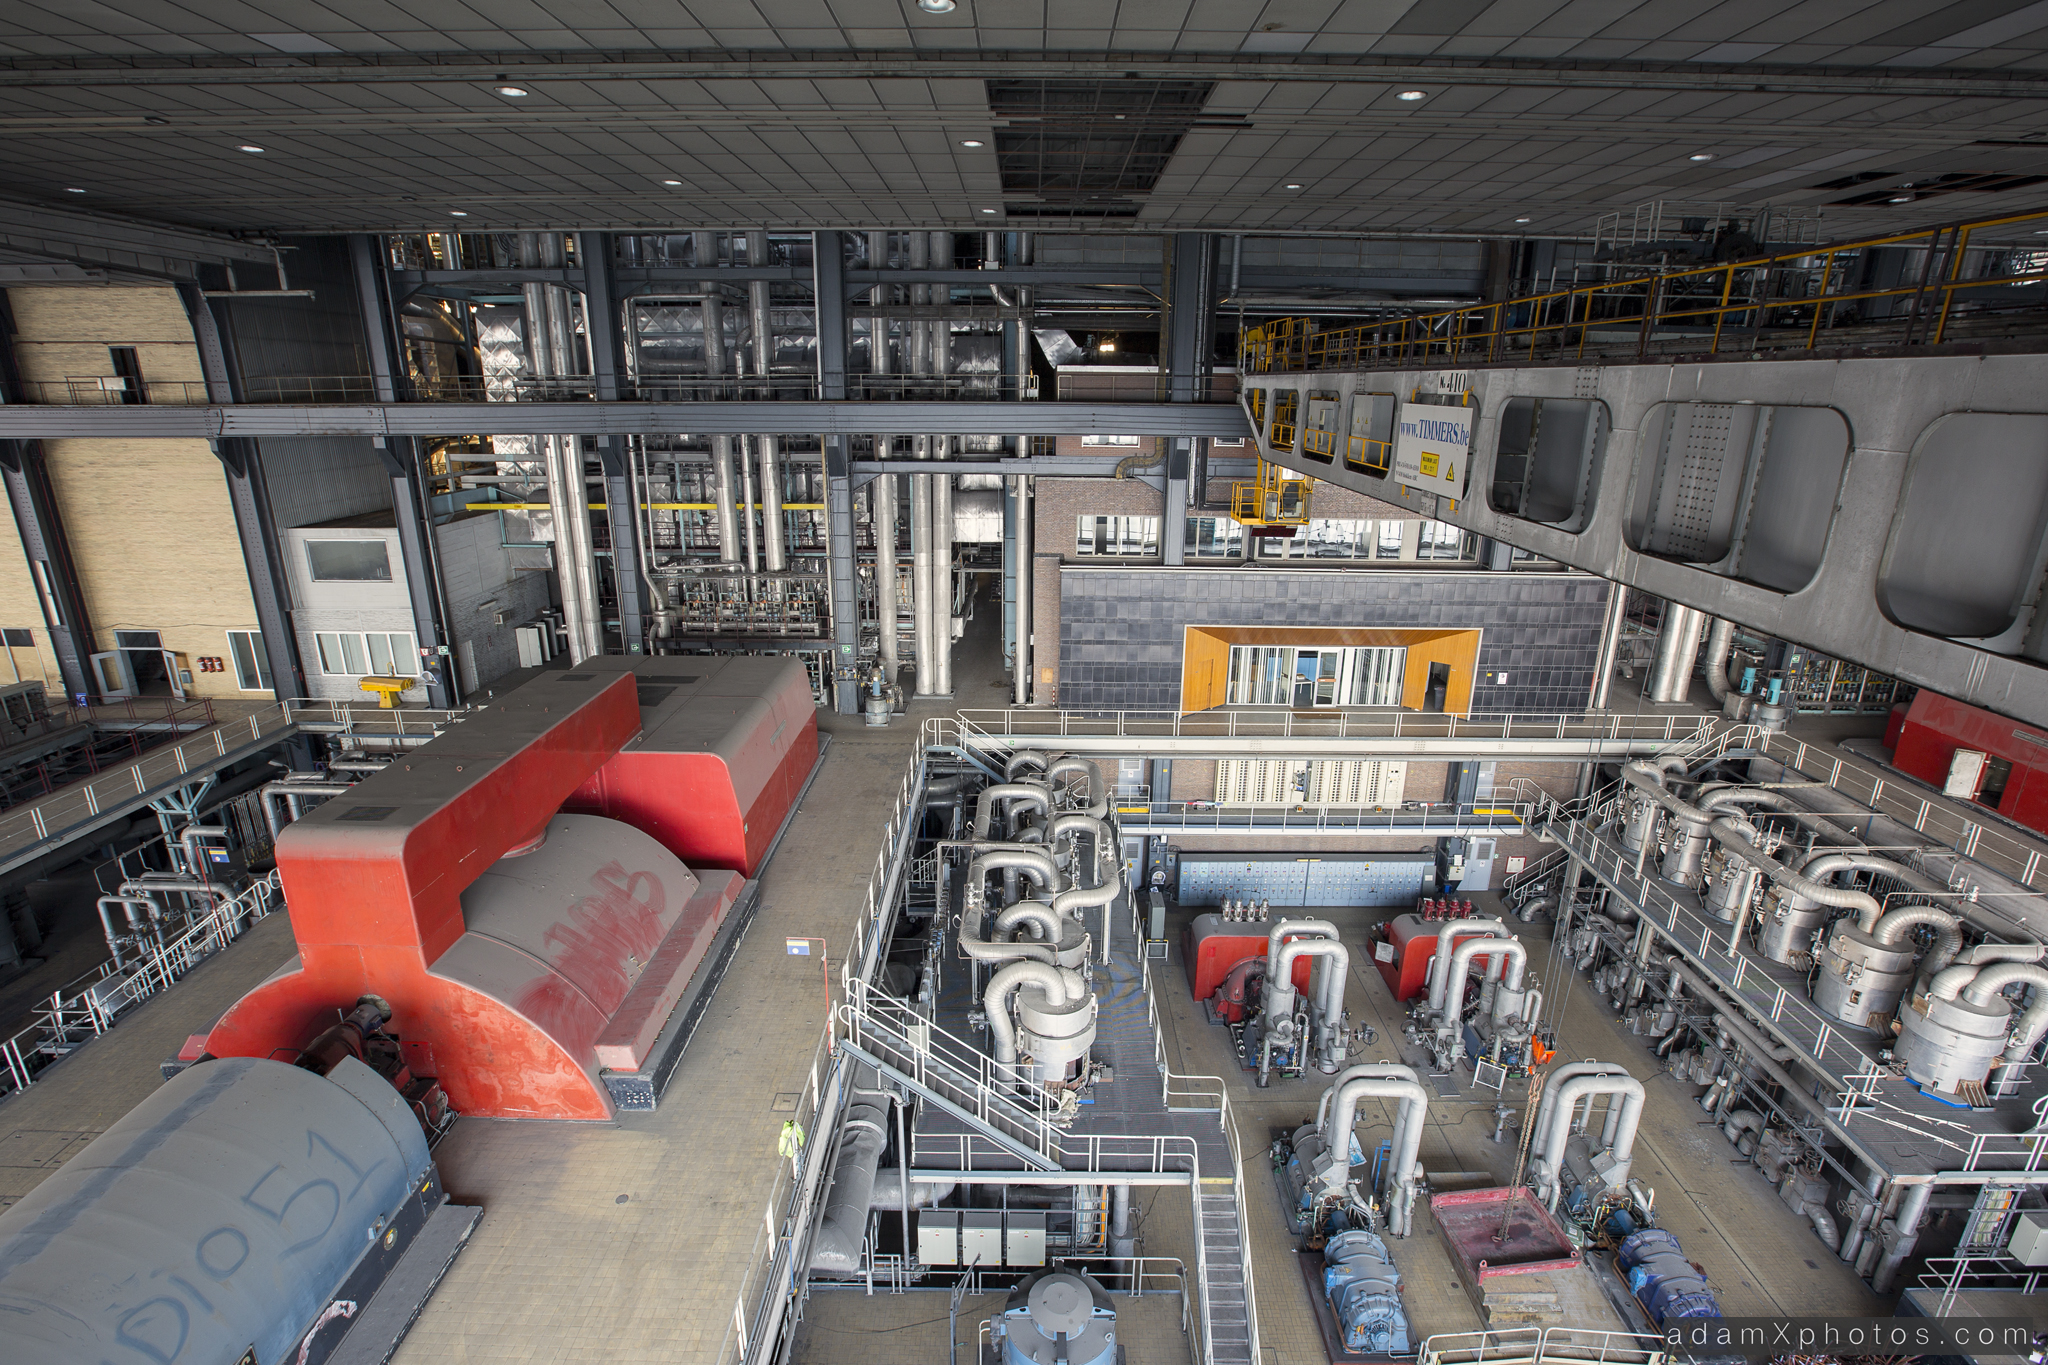 Explore 84 Powerplant Gigawatt aka XL aka The Cloud Factory